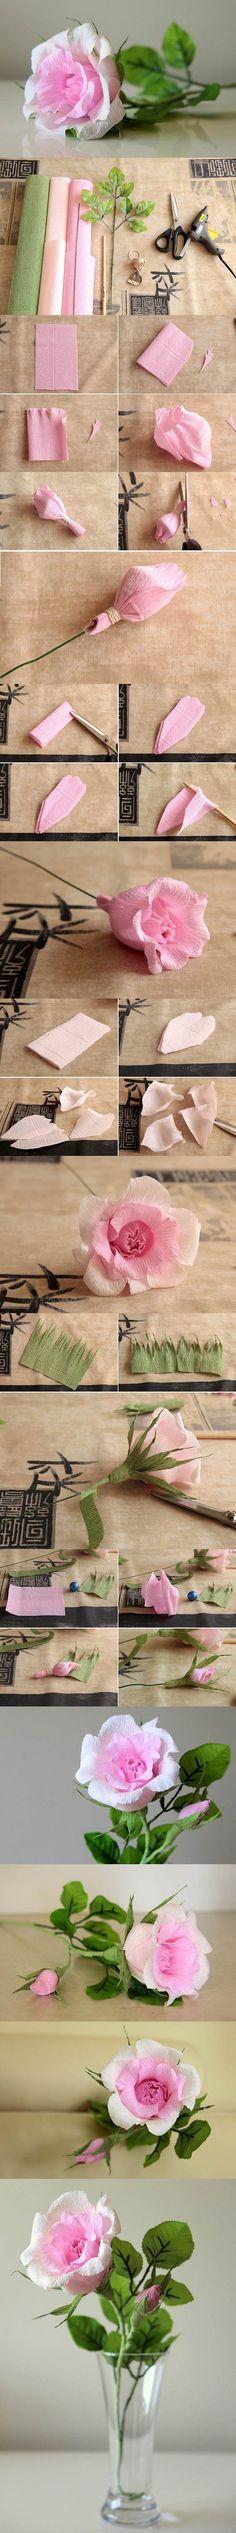 DIY Beautiful Pink Crepe Paper Rose | iCreativeIdeas.com LIKE Us on Facebook == https://www.facebook.com/icreativeideas